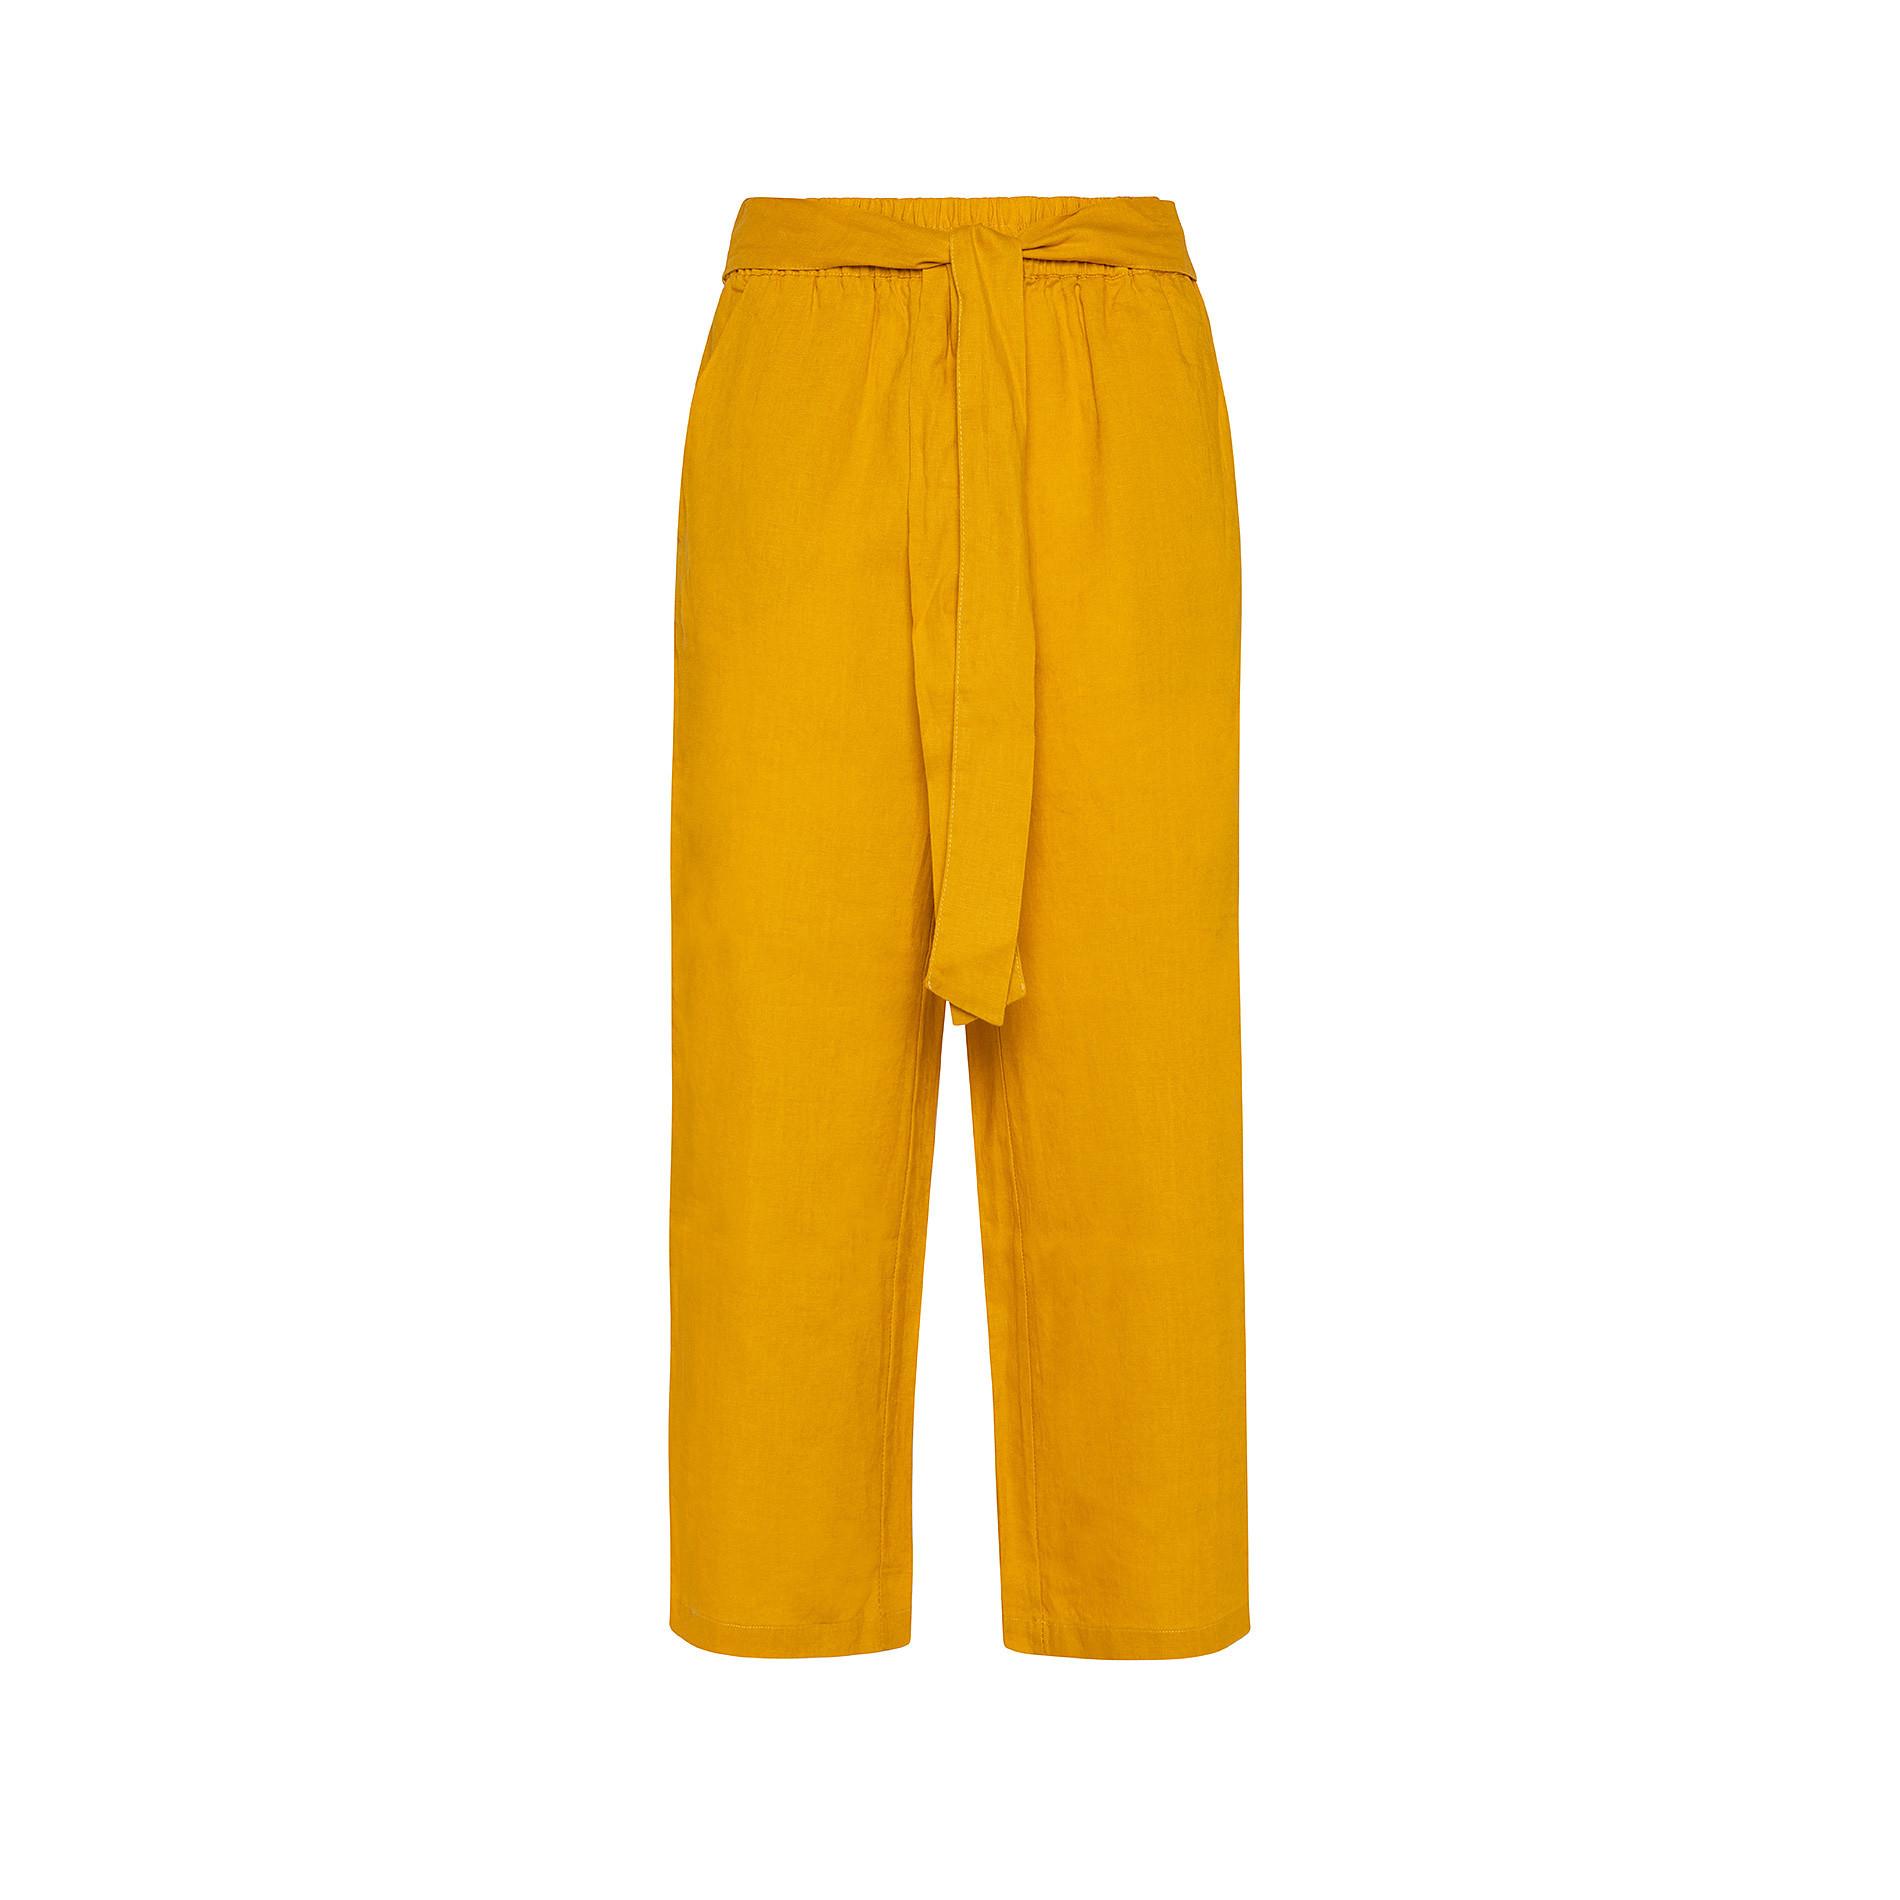 Pantalone puro lino con fusciacca Koan, Arancione, large image number 0